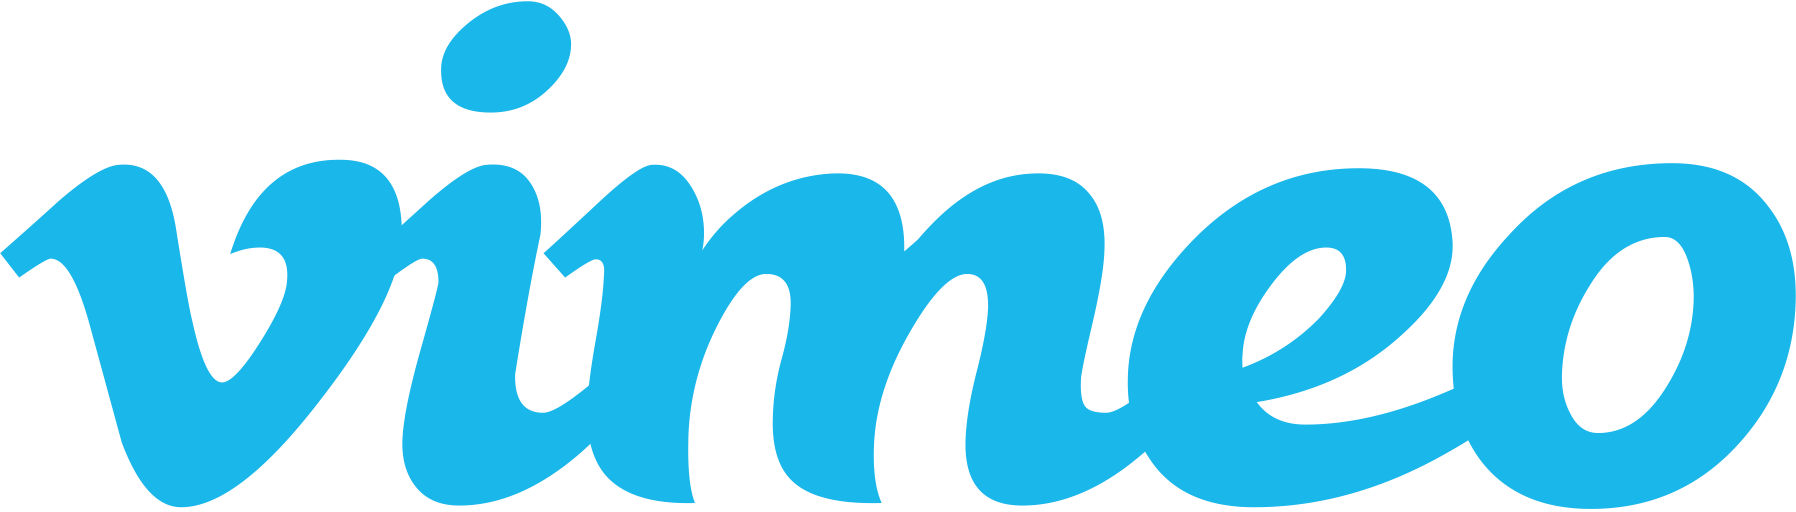 Image result for vimeo logo png free download